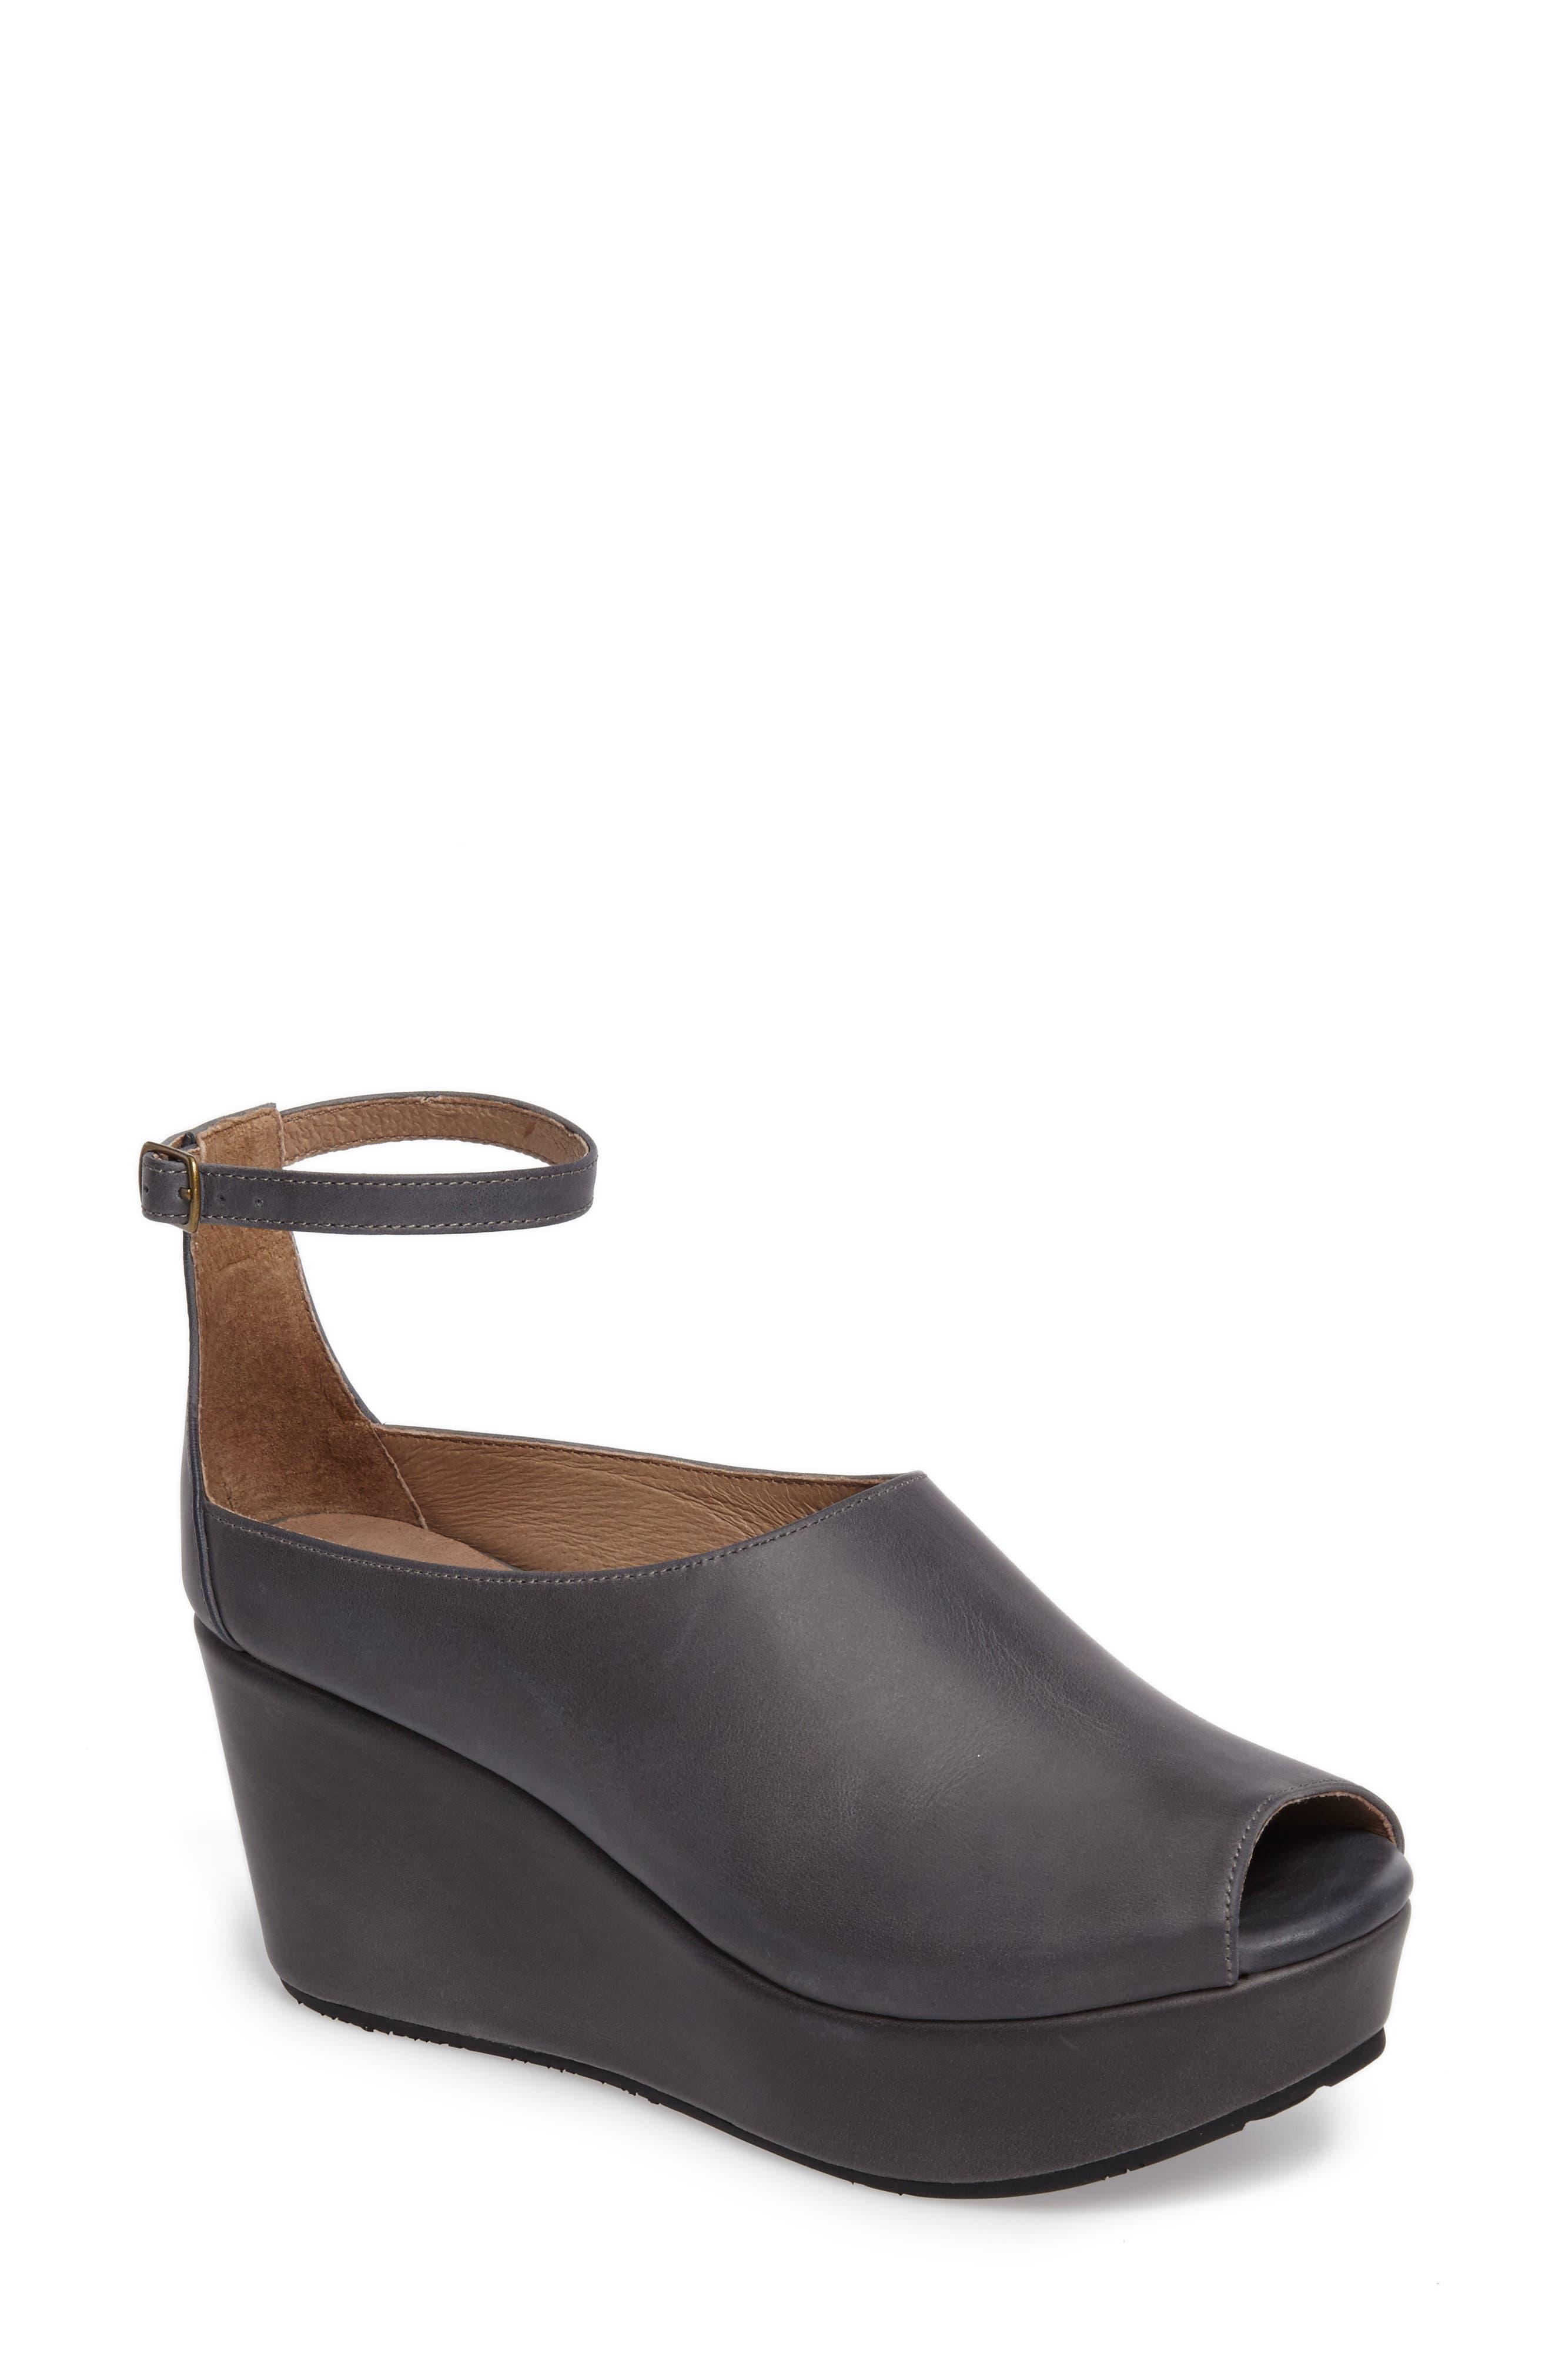 Alternate Image 1 Selected - Chocolat Blu Walter Ankle Strap Wedge Sandal (Women)